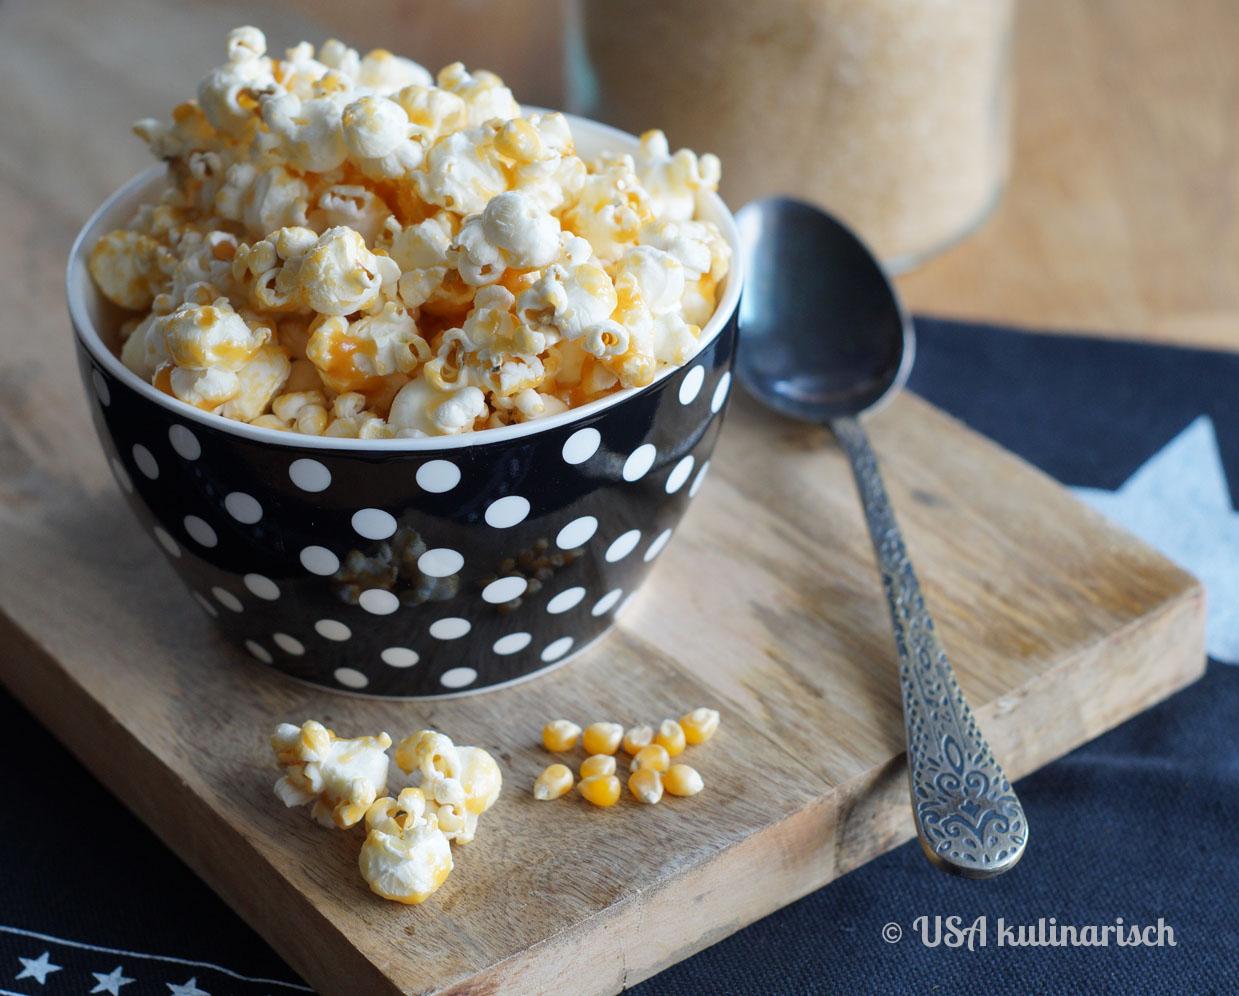 Salted Caramel Popcorn (Salzkaramell-Popcorn)